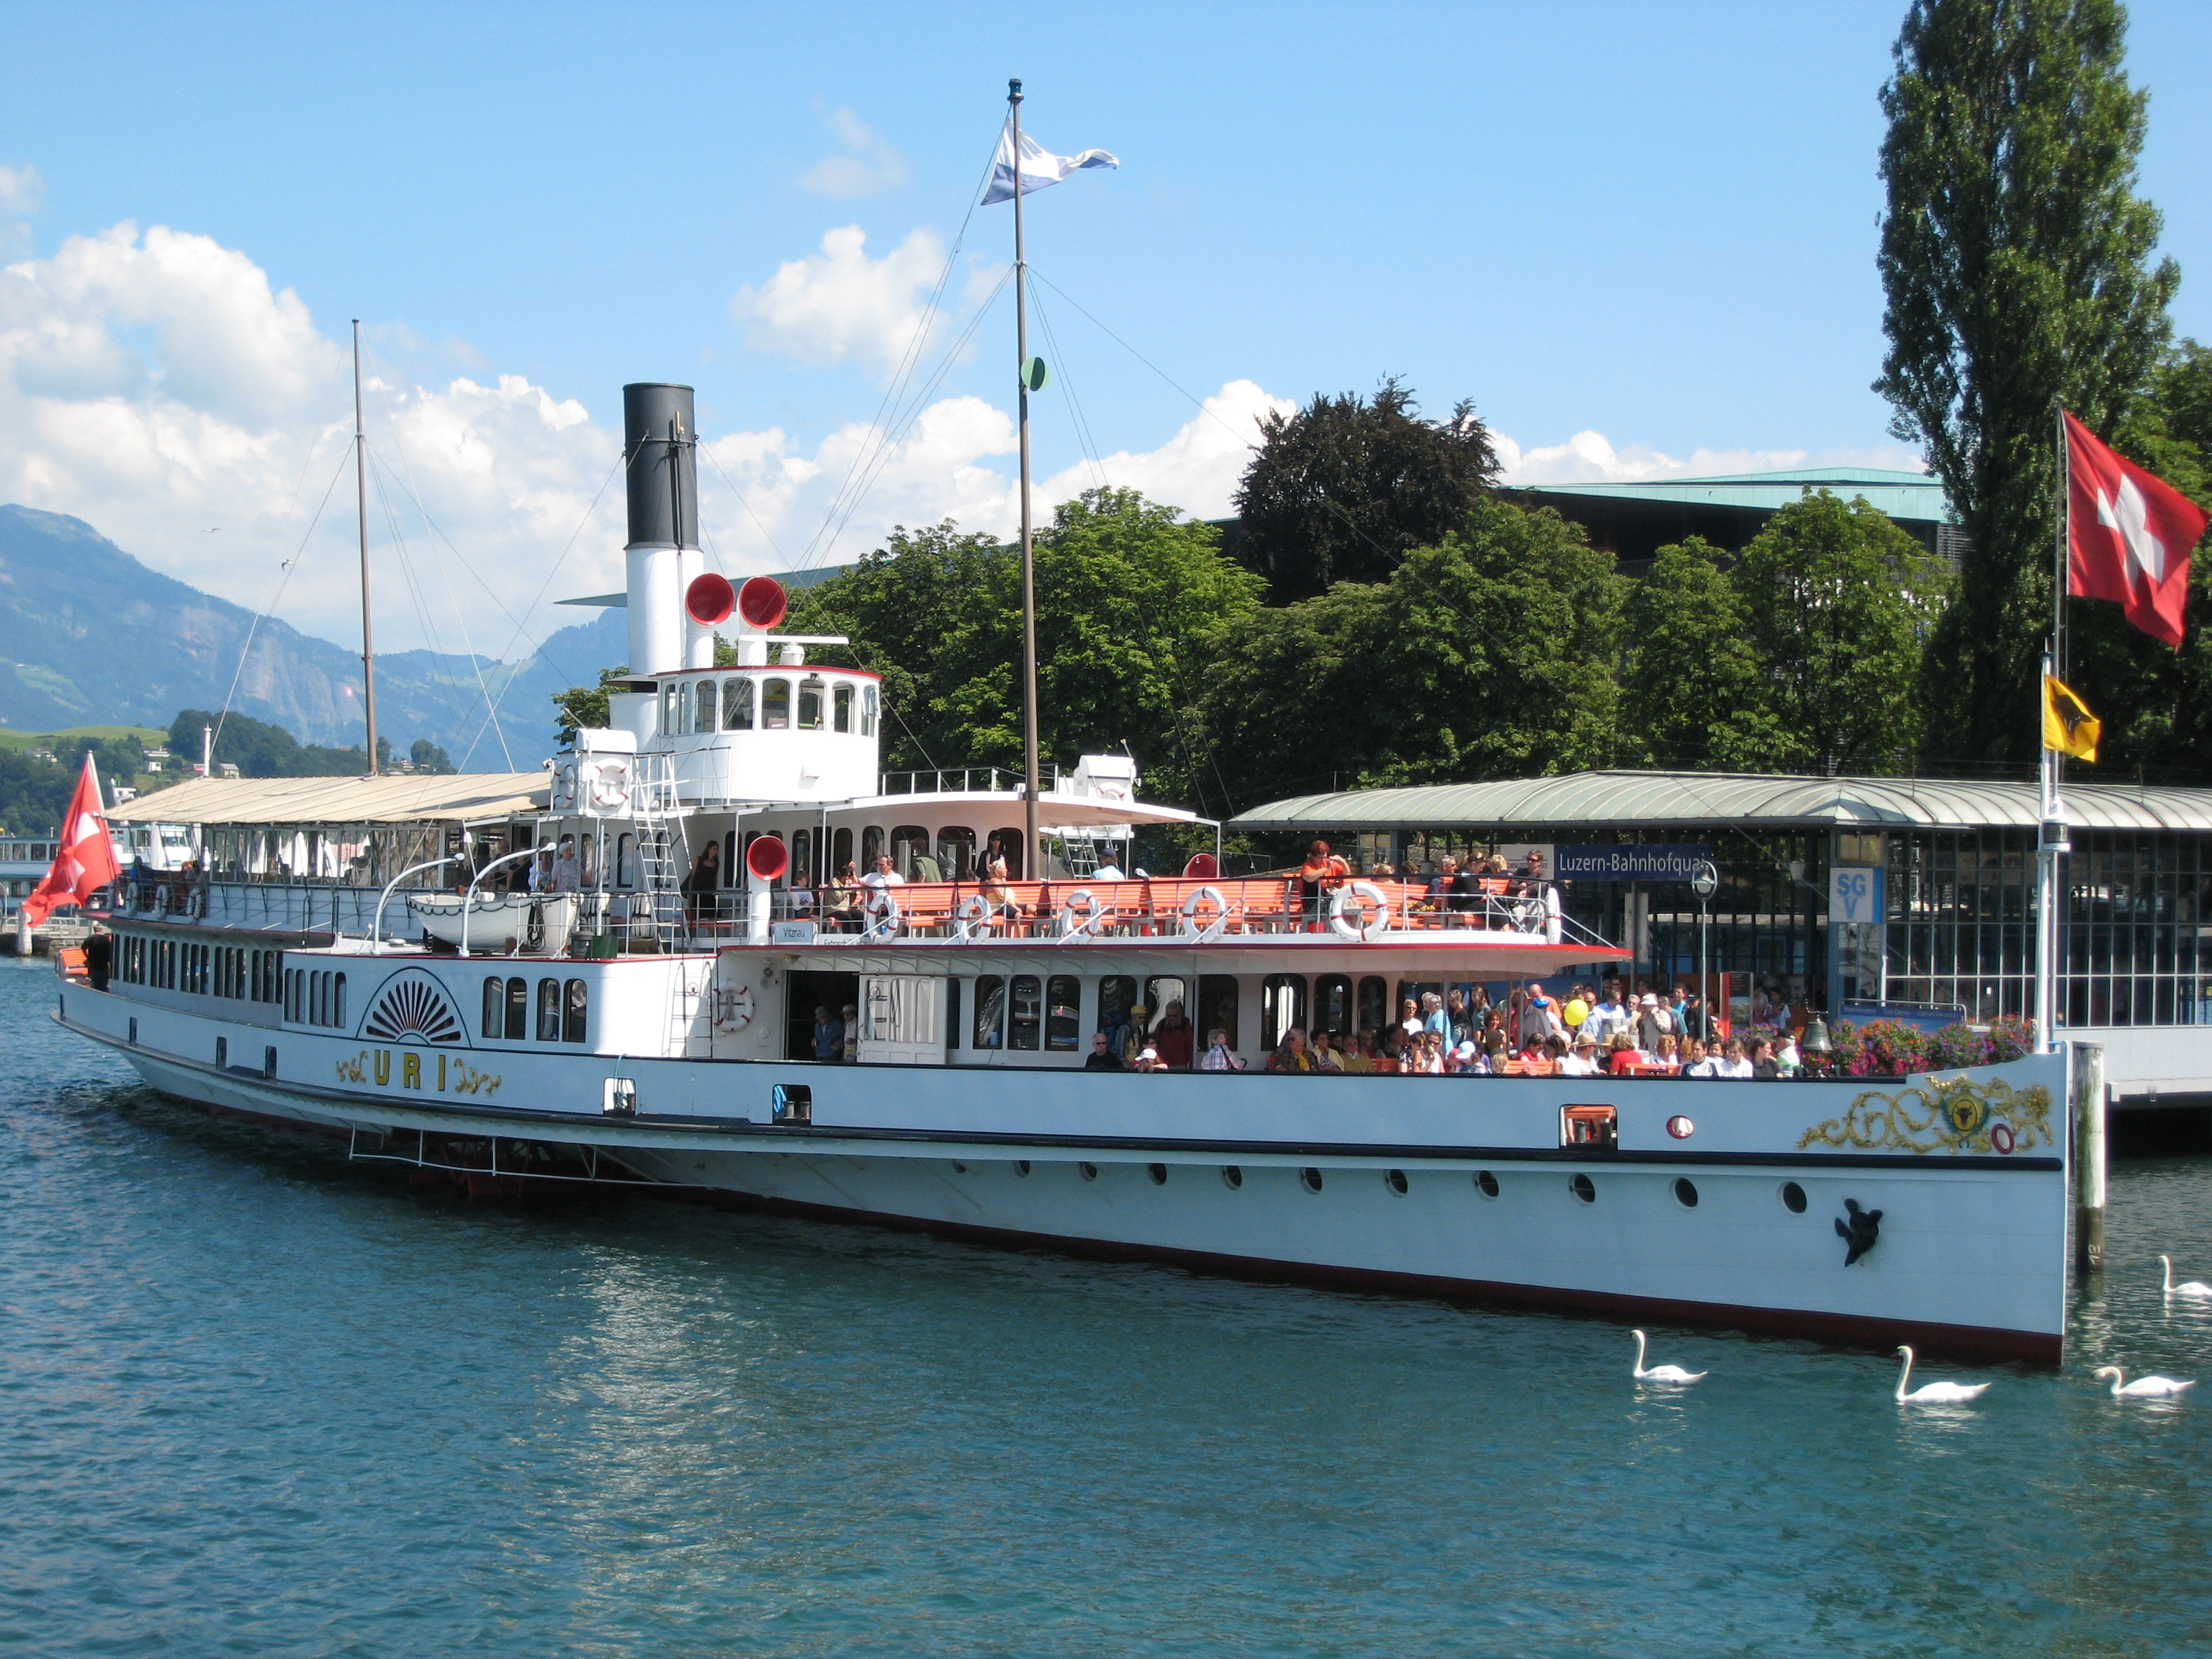 File Dampfschiff Uri In Luzern Jpg Wikimedia Commons